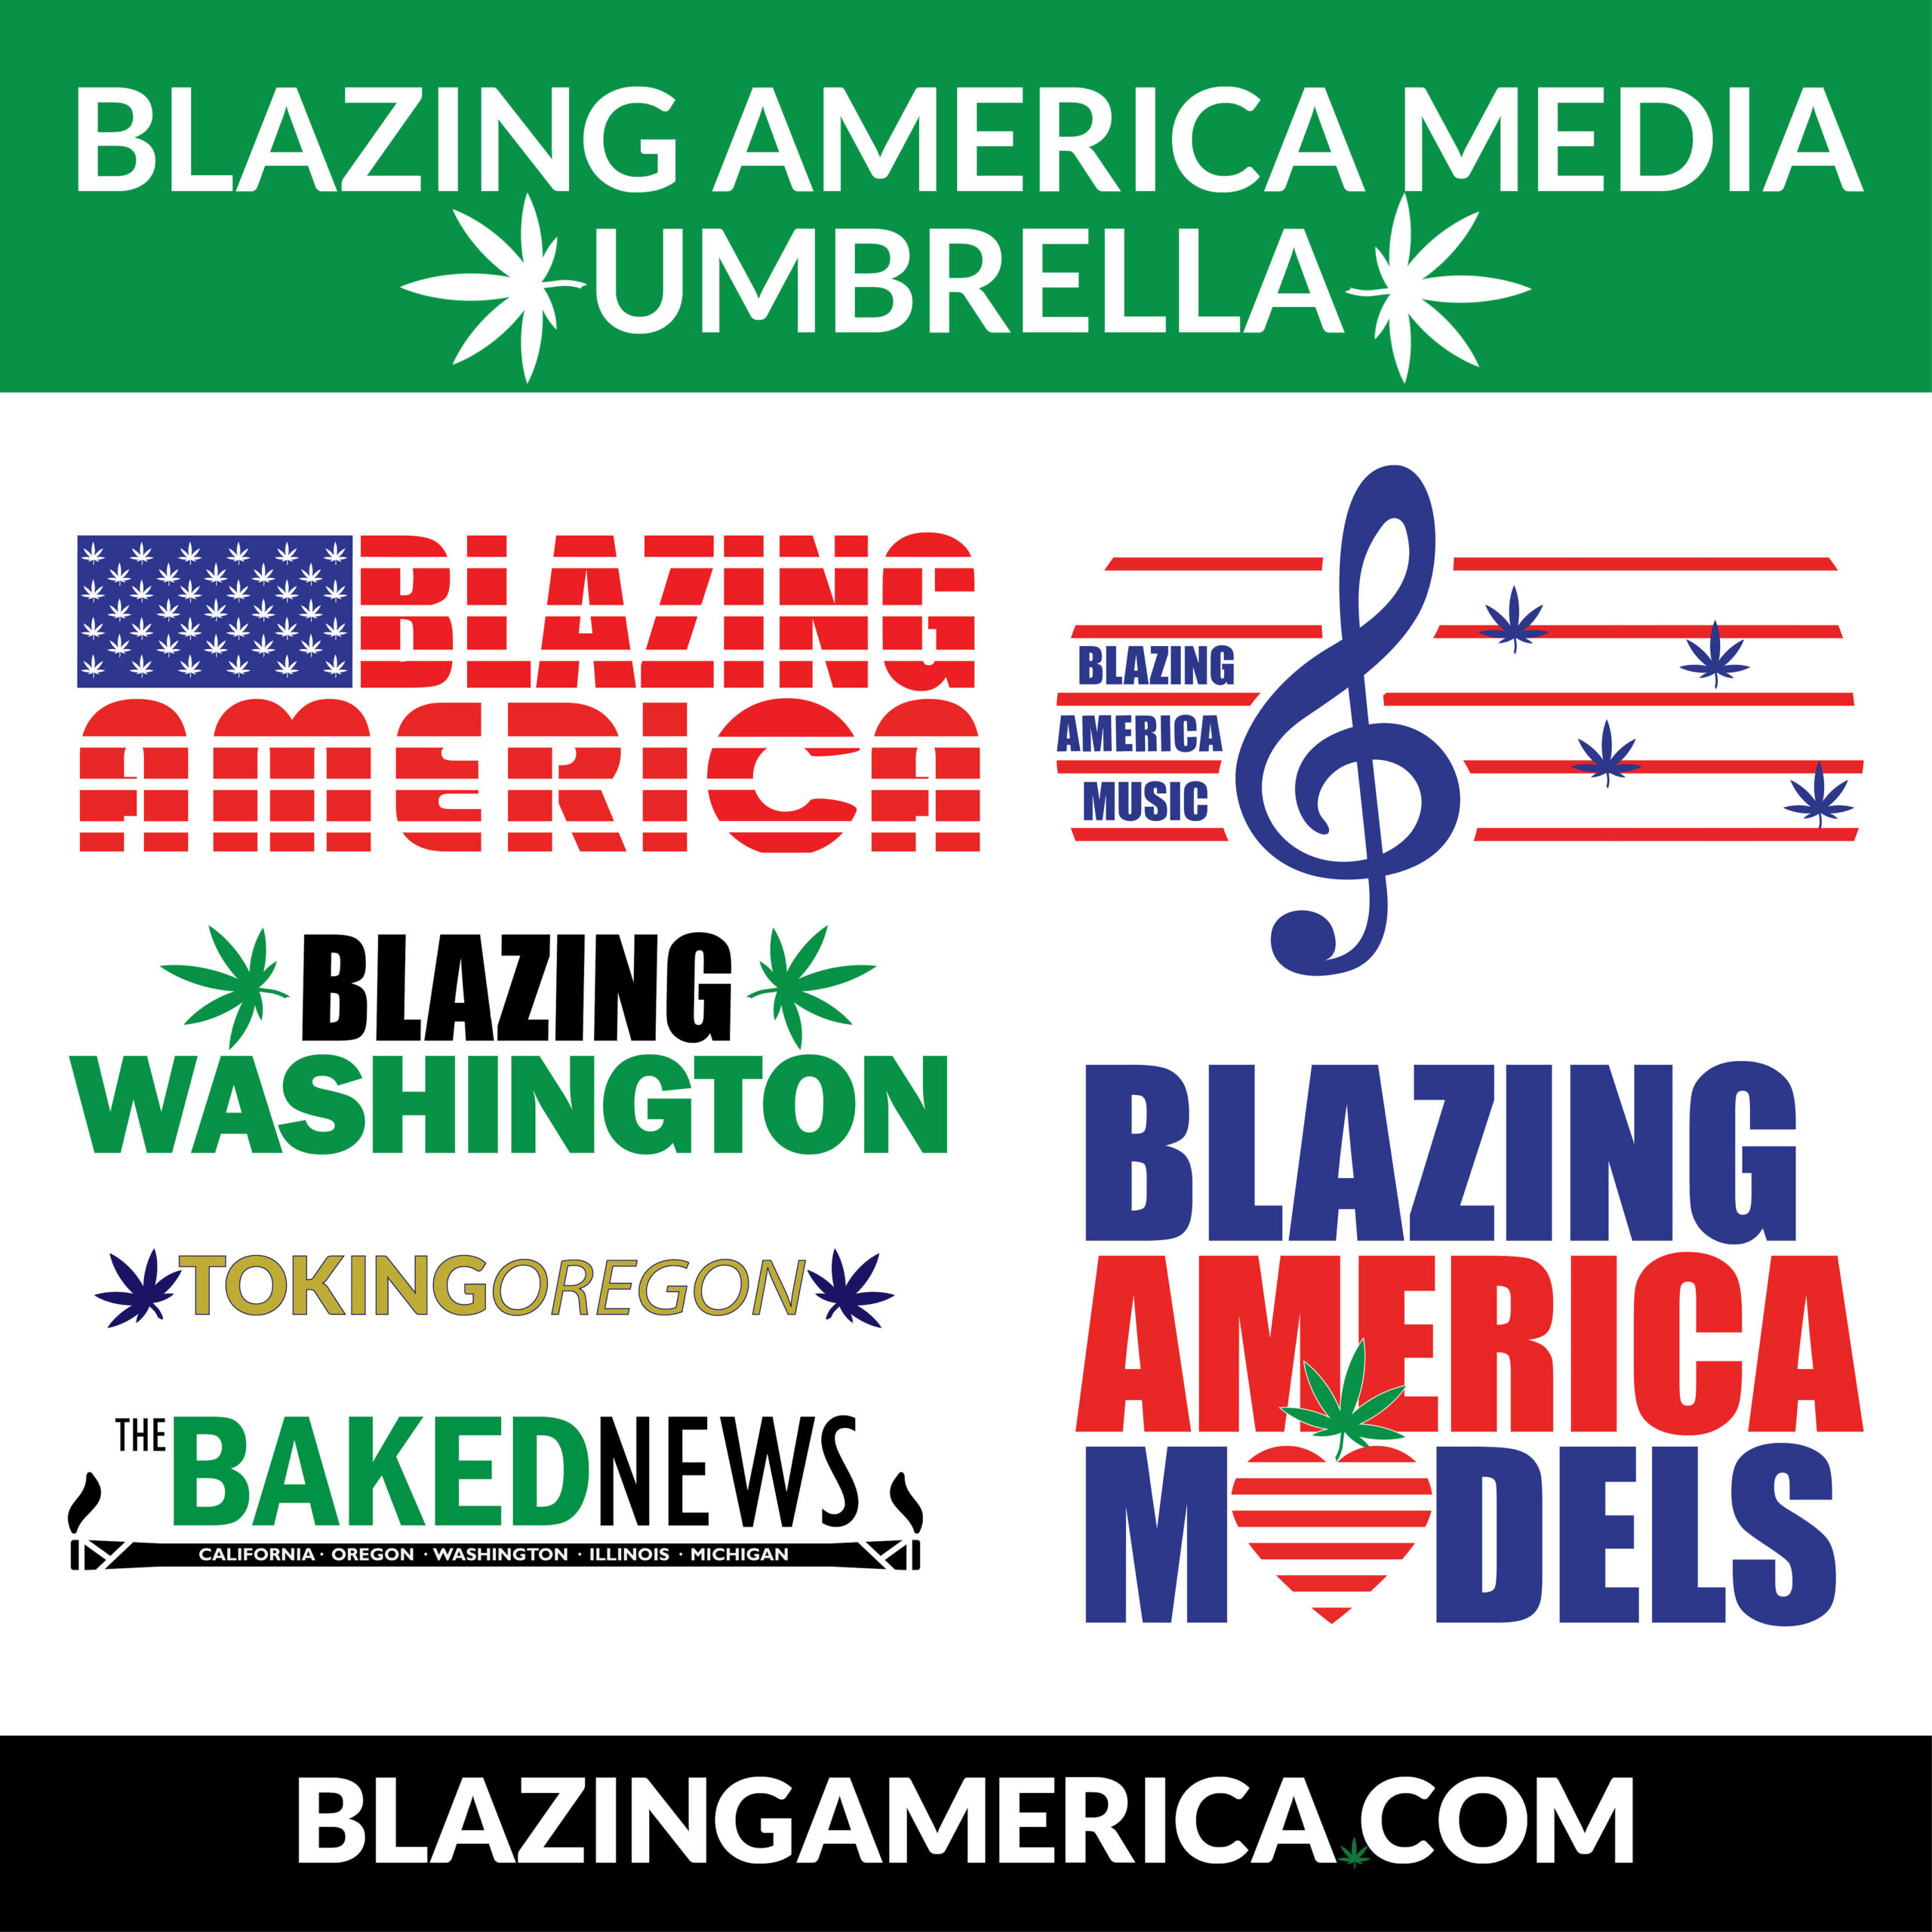 Blazing America